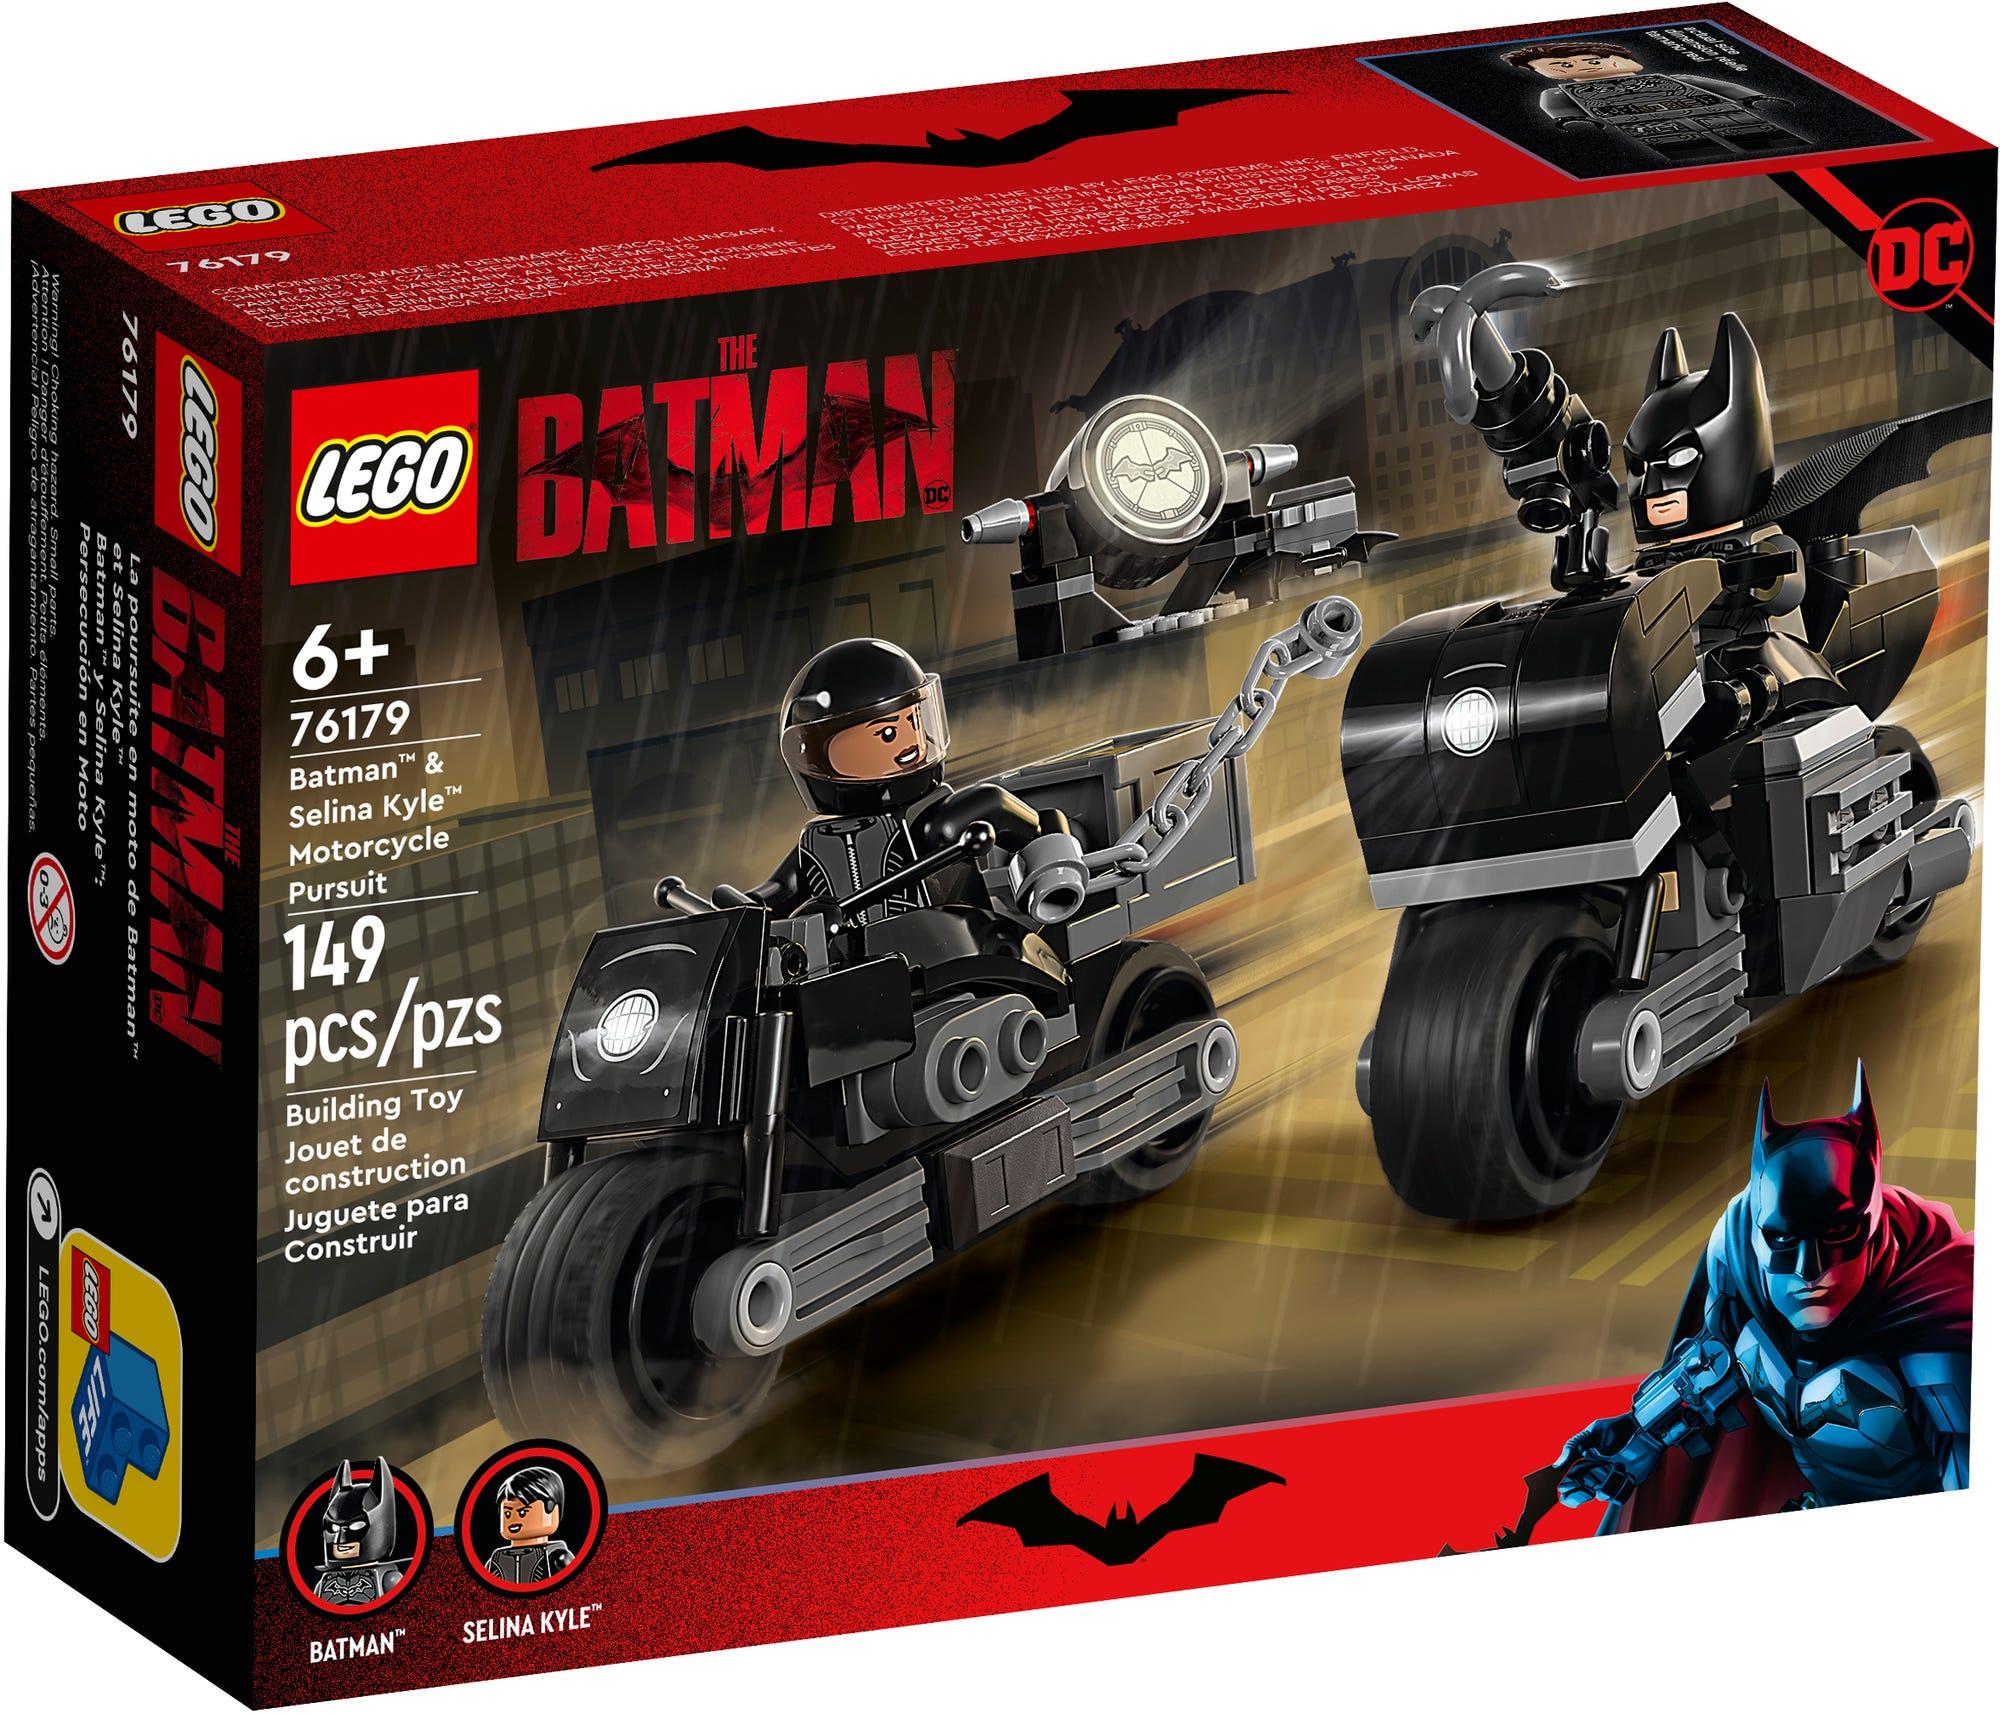 LEGO Dc 76179 Batman & Selina Kyle Verfolgungsjagdauf Dem Motorrad 2